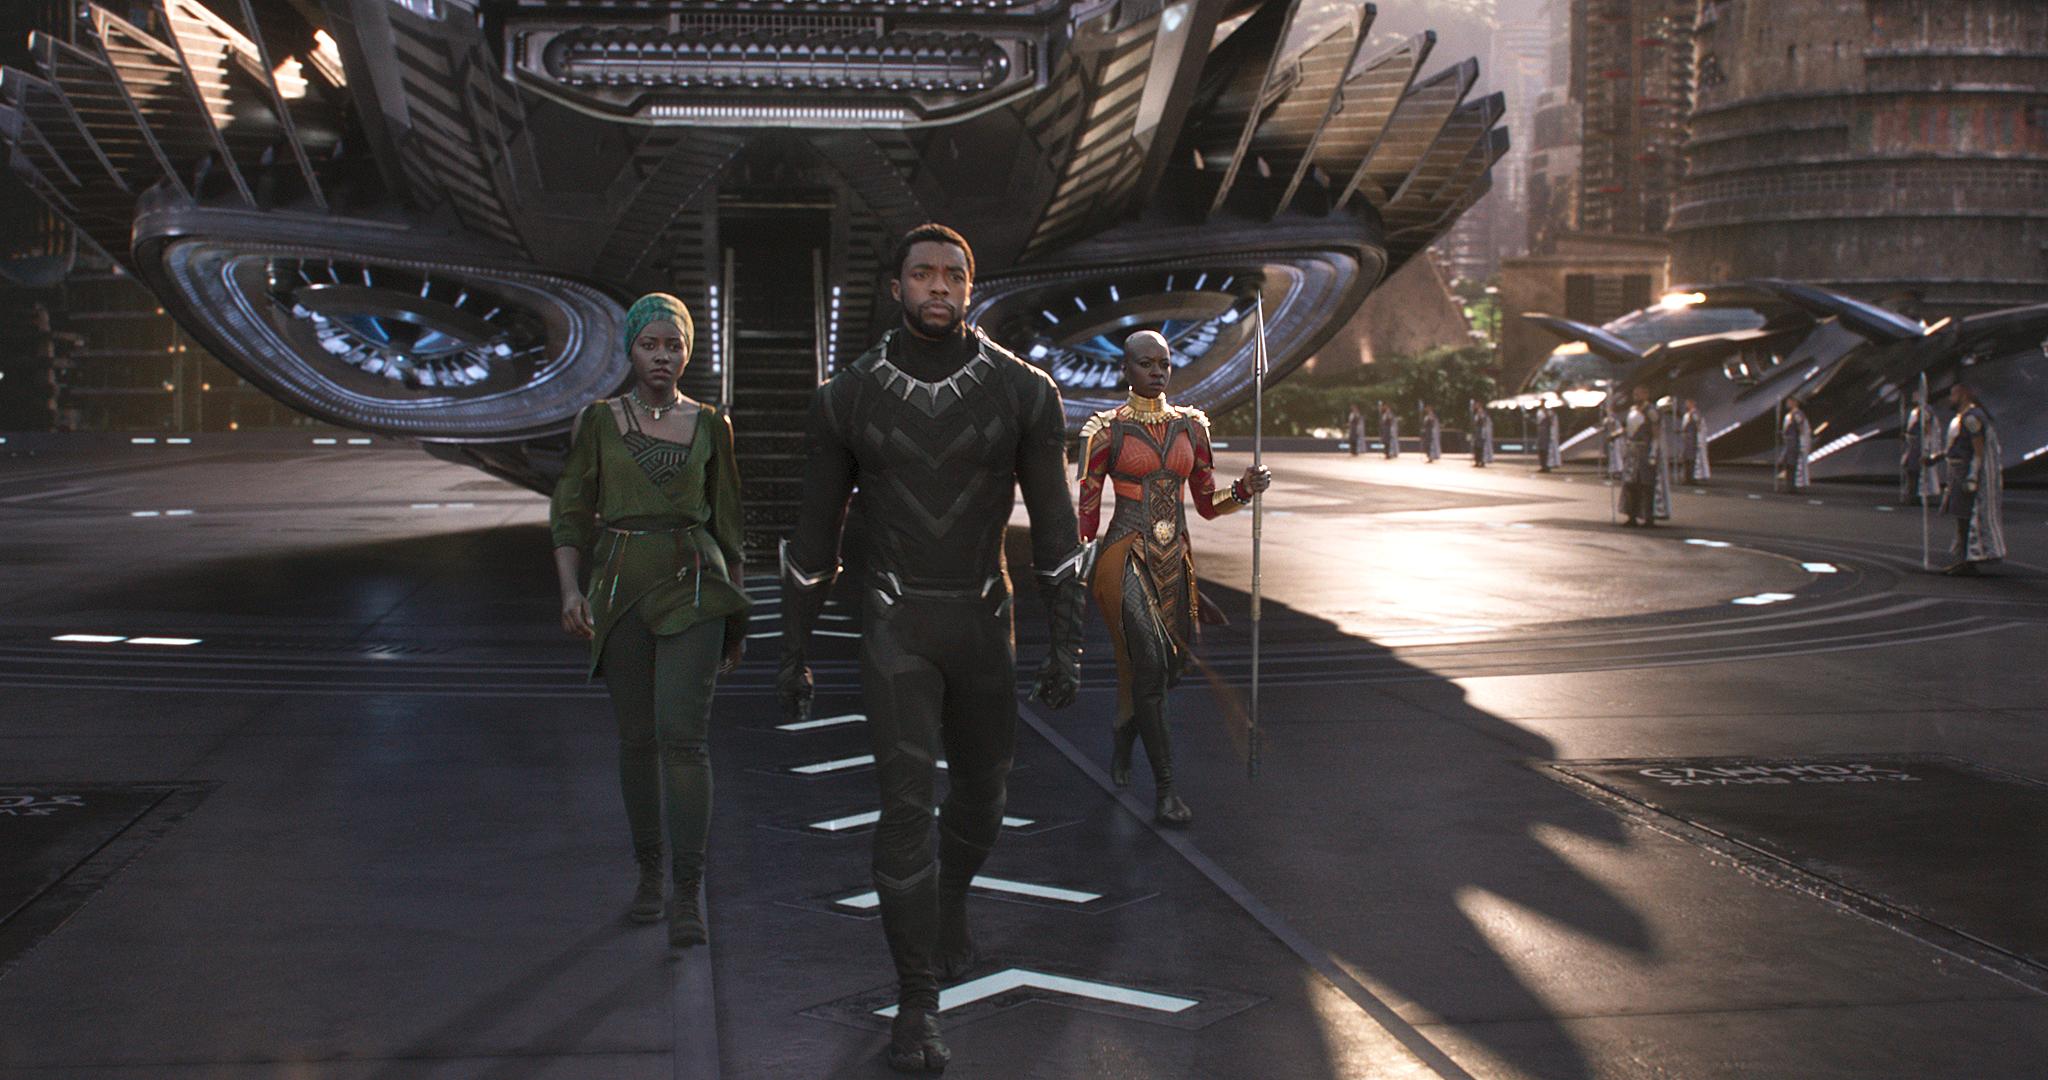 Marvel Studios' BLACK PANTHER L to R: Nakia (Lupita Nyong'o), T'Challa/Black Panther (Chadwick Boseman) and Okoye (Danai Gurira) Ph: Film Frame ©Marvel Studios 2018